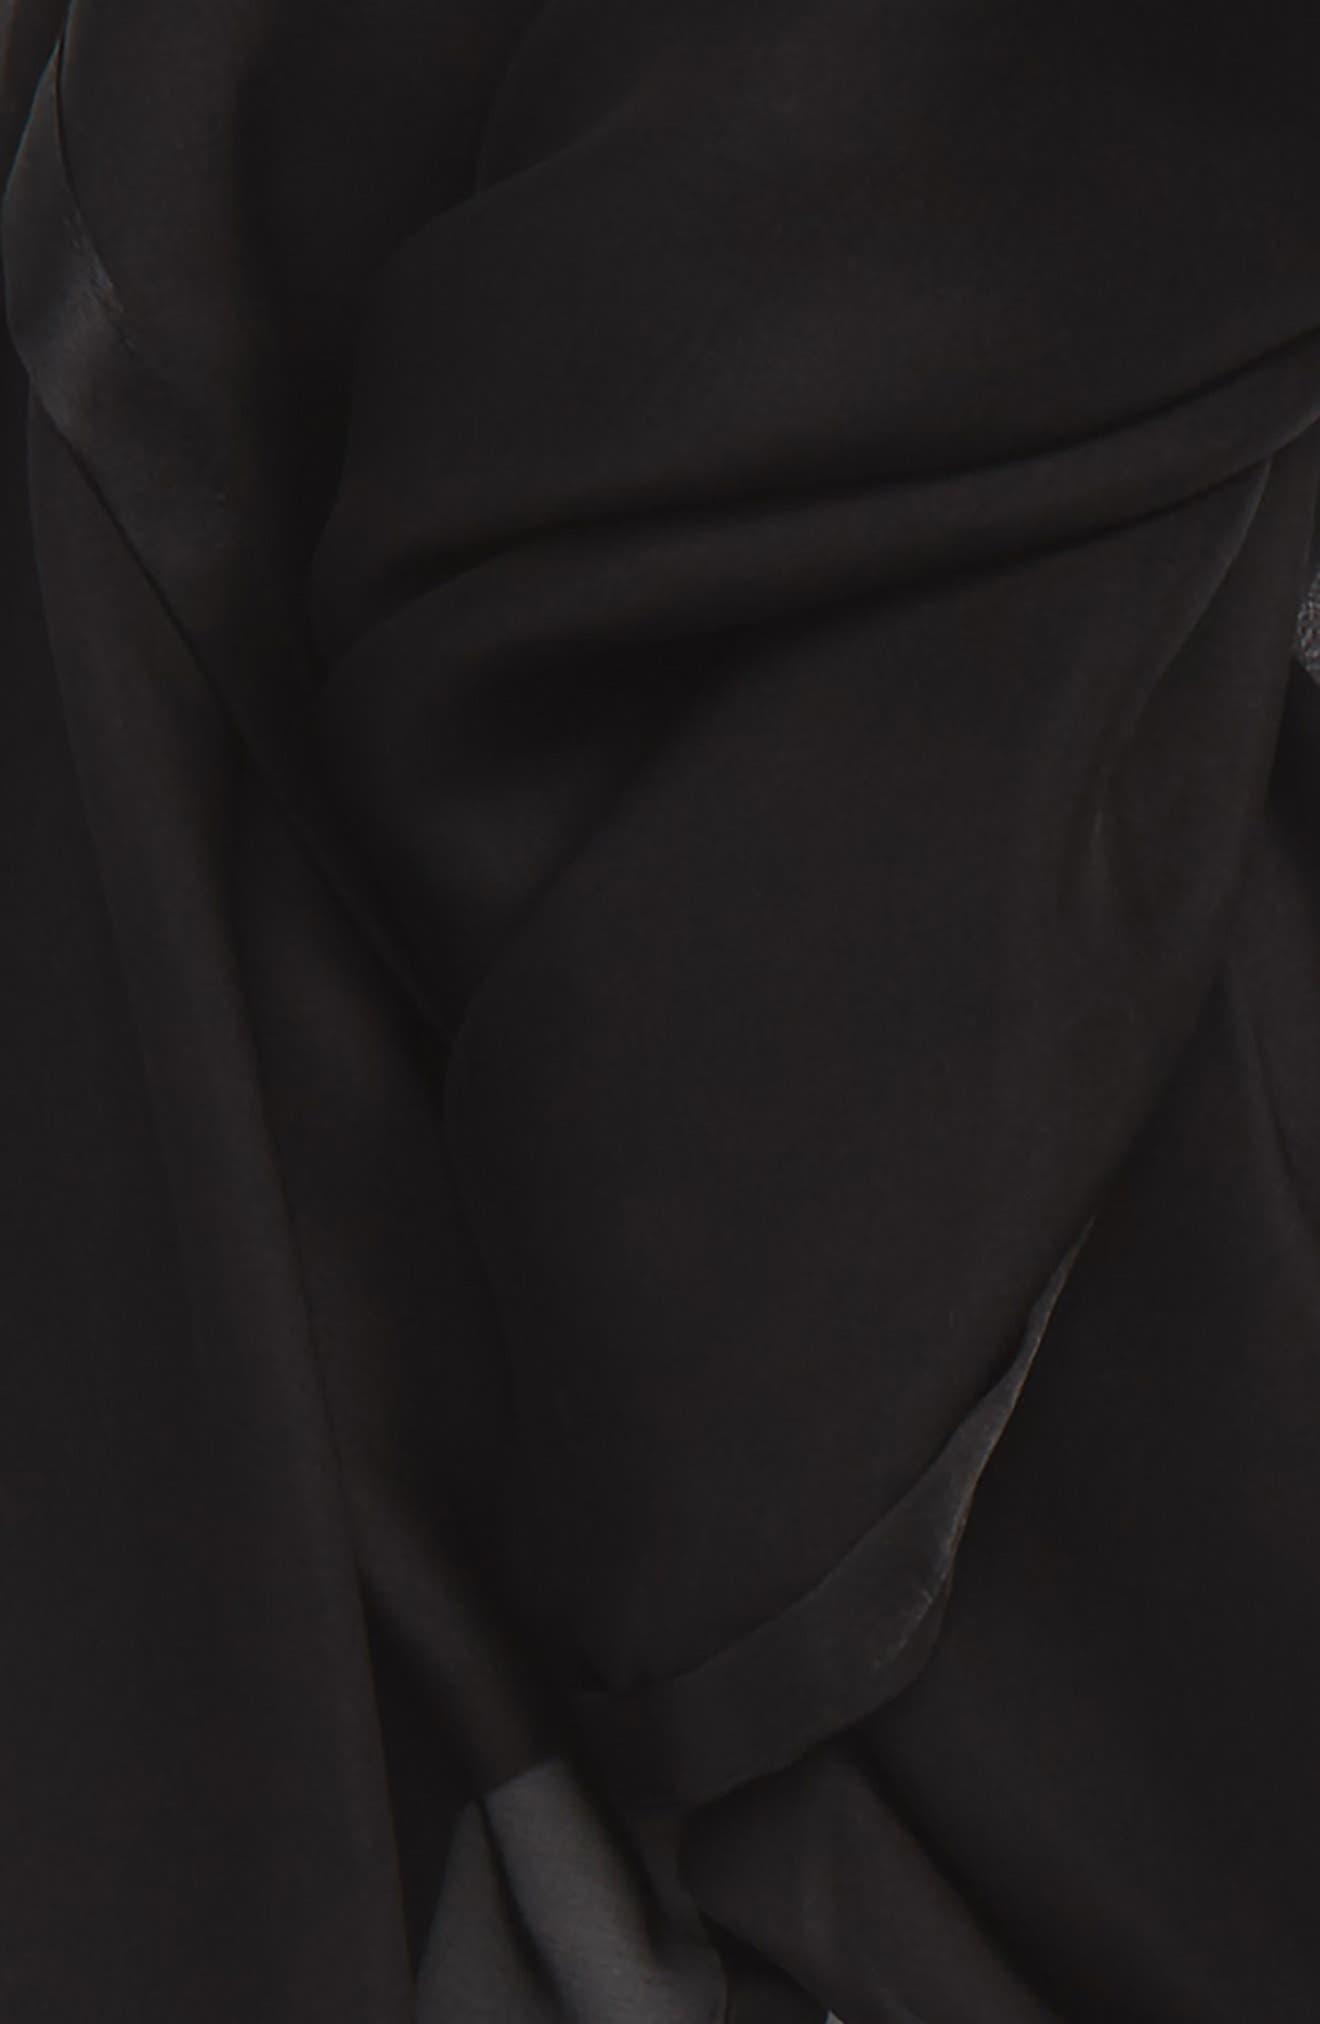 Satin Border Silk Chiffon Scarf,                             Alternate thumbnail 3, color,                             BLACK